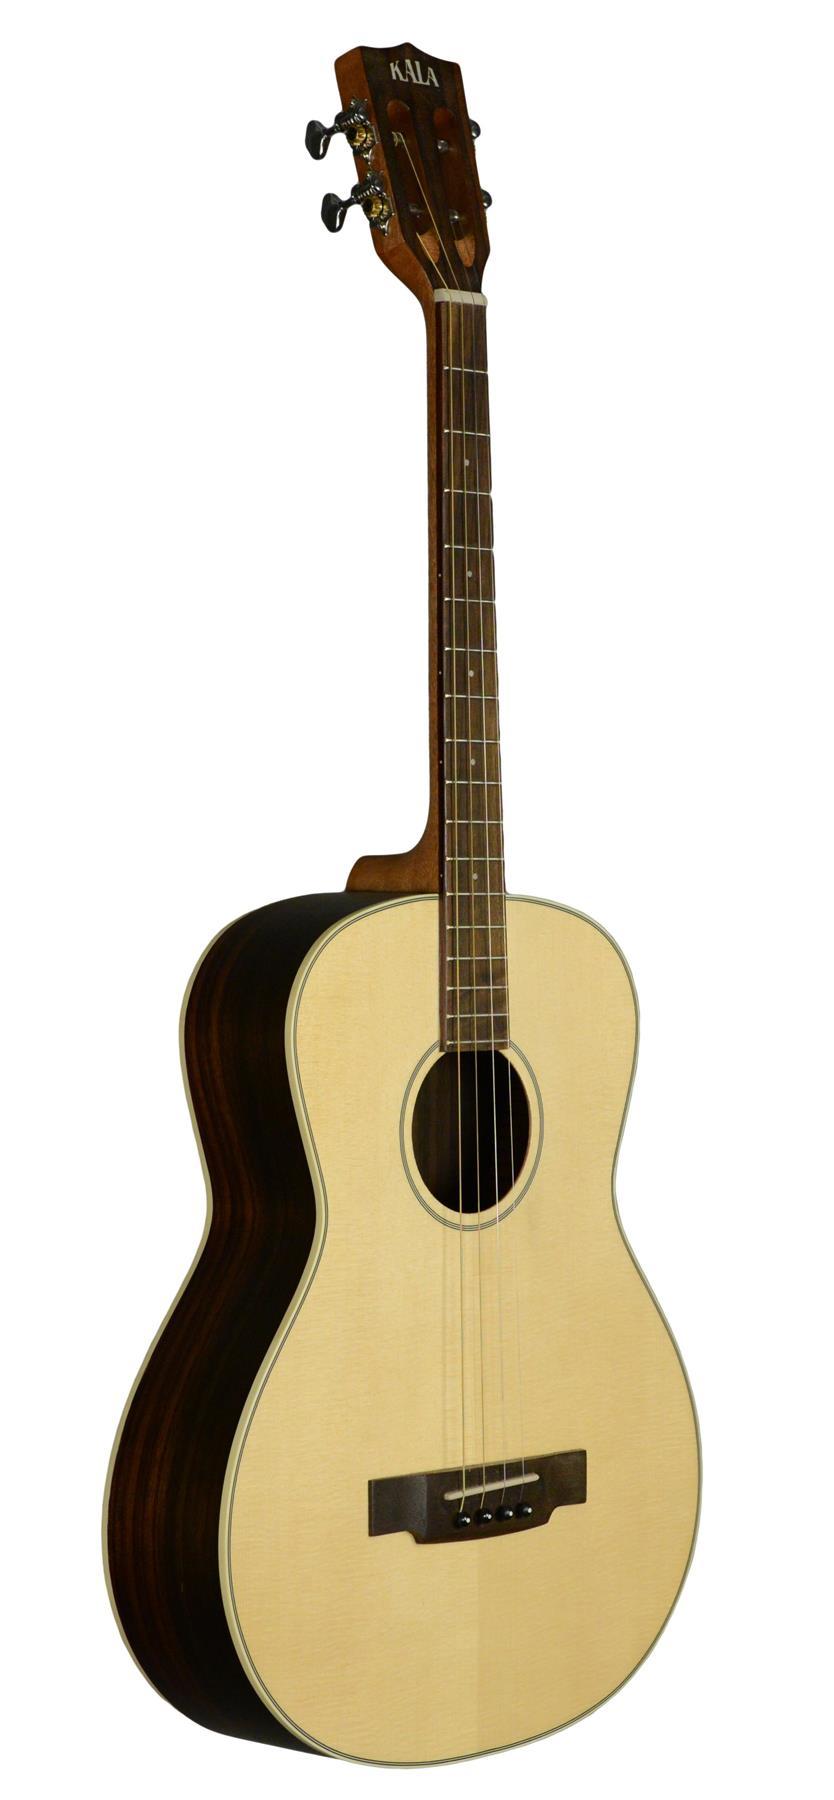 Kala Tenor Guitar